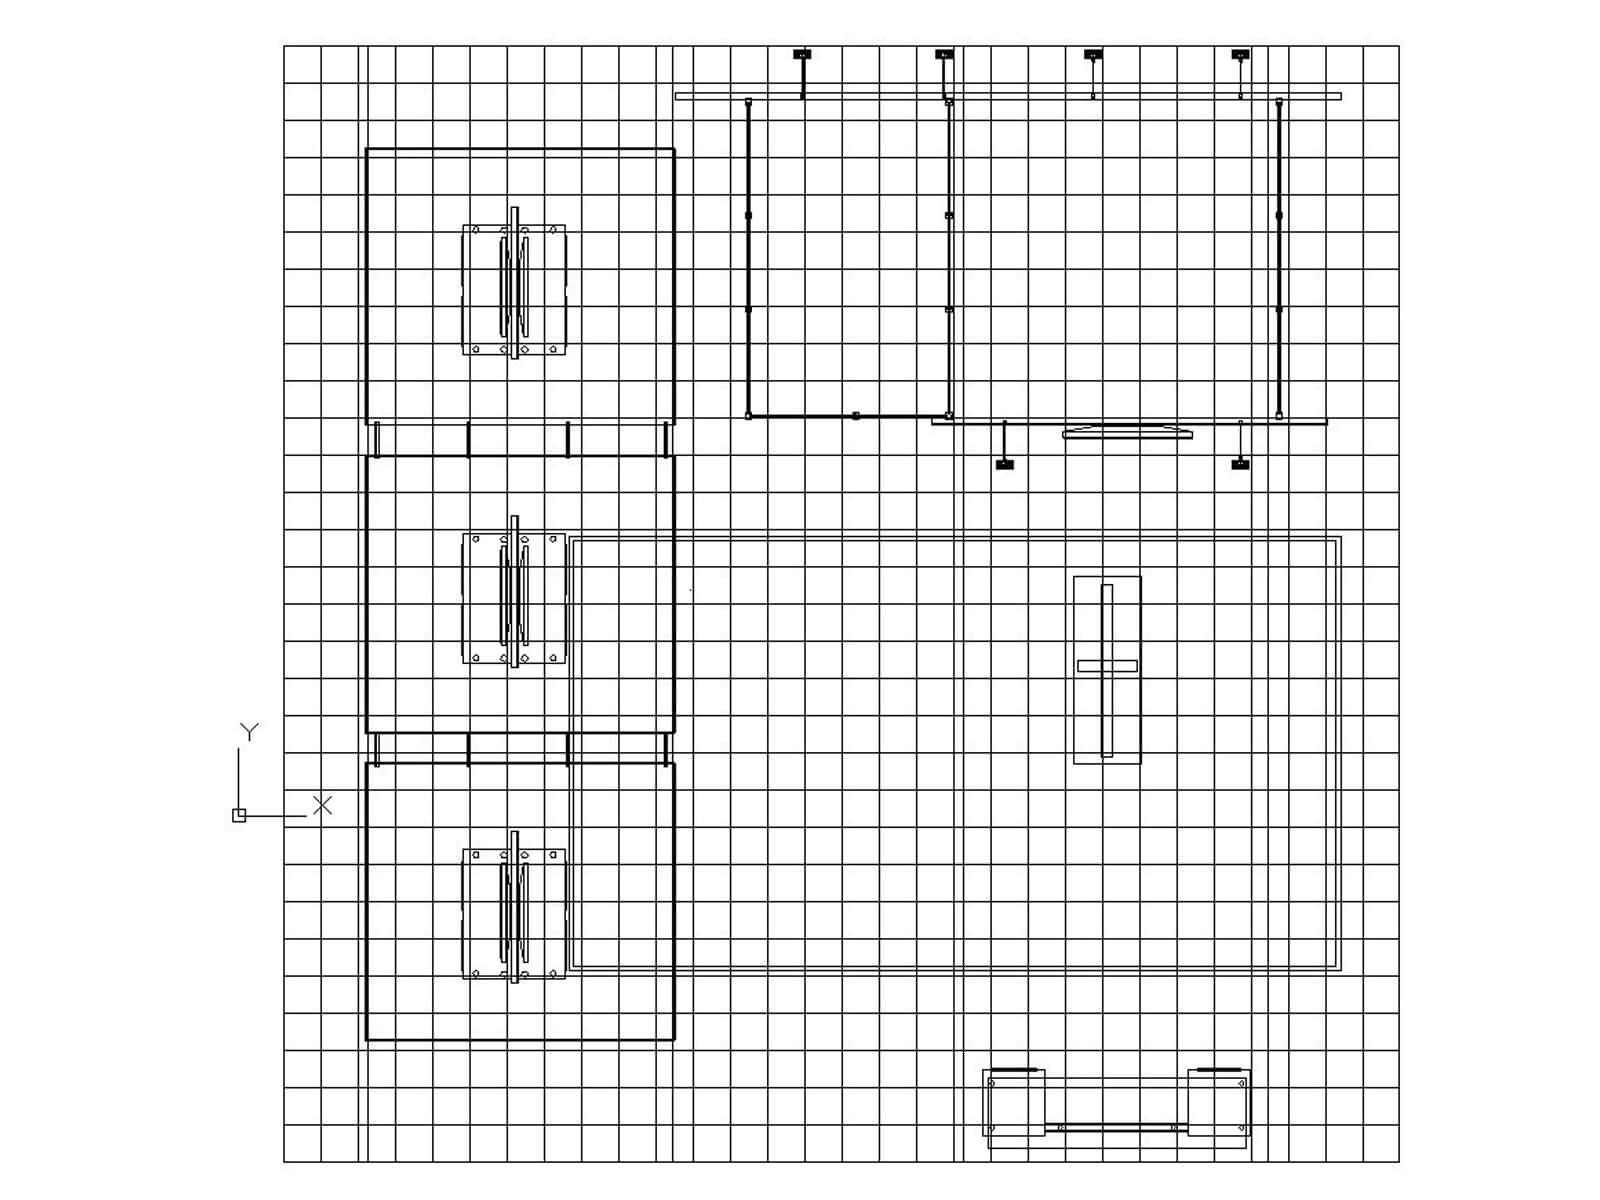 ECO-6084 Hybrid S Island - plan view